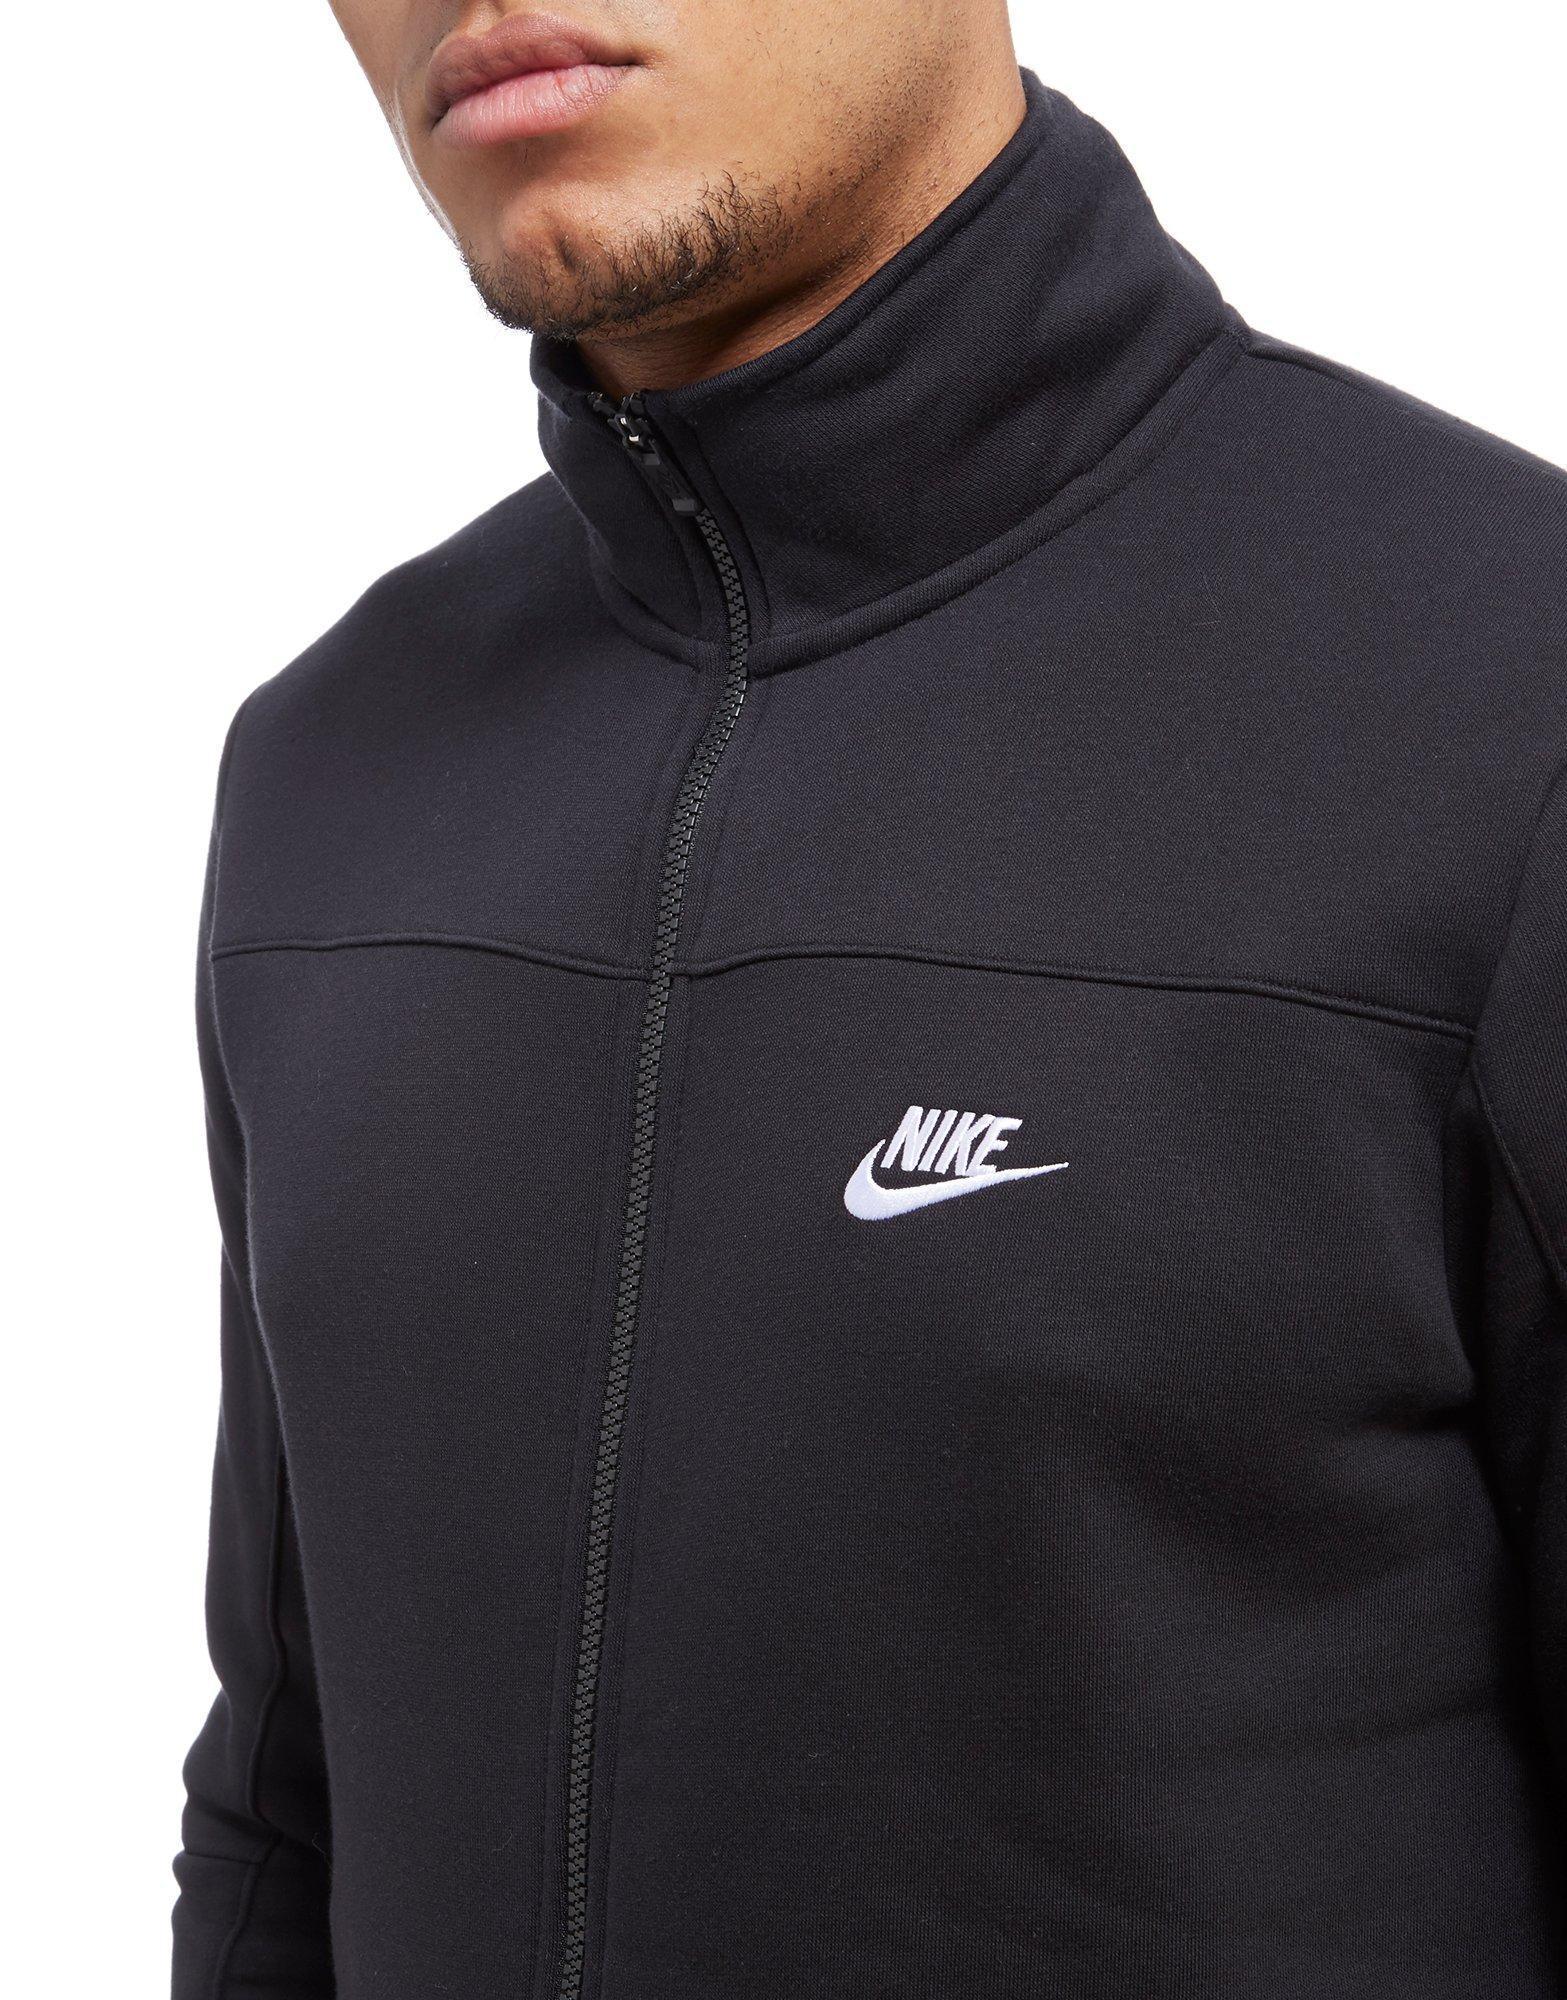 a7f92aa5ead03 Nike Jumpsuit Mens Amazon | Lixnet AG